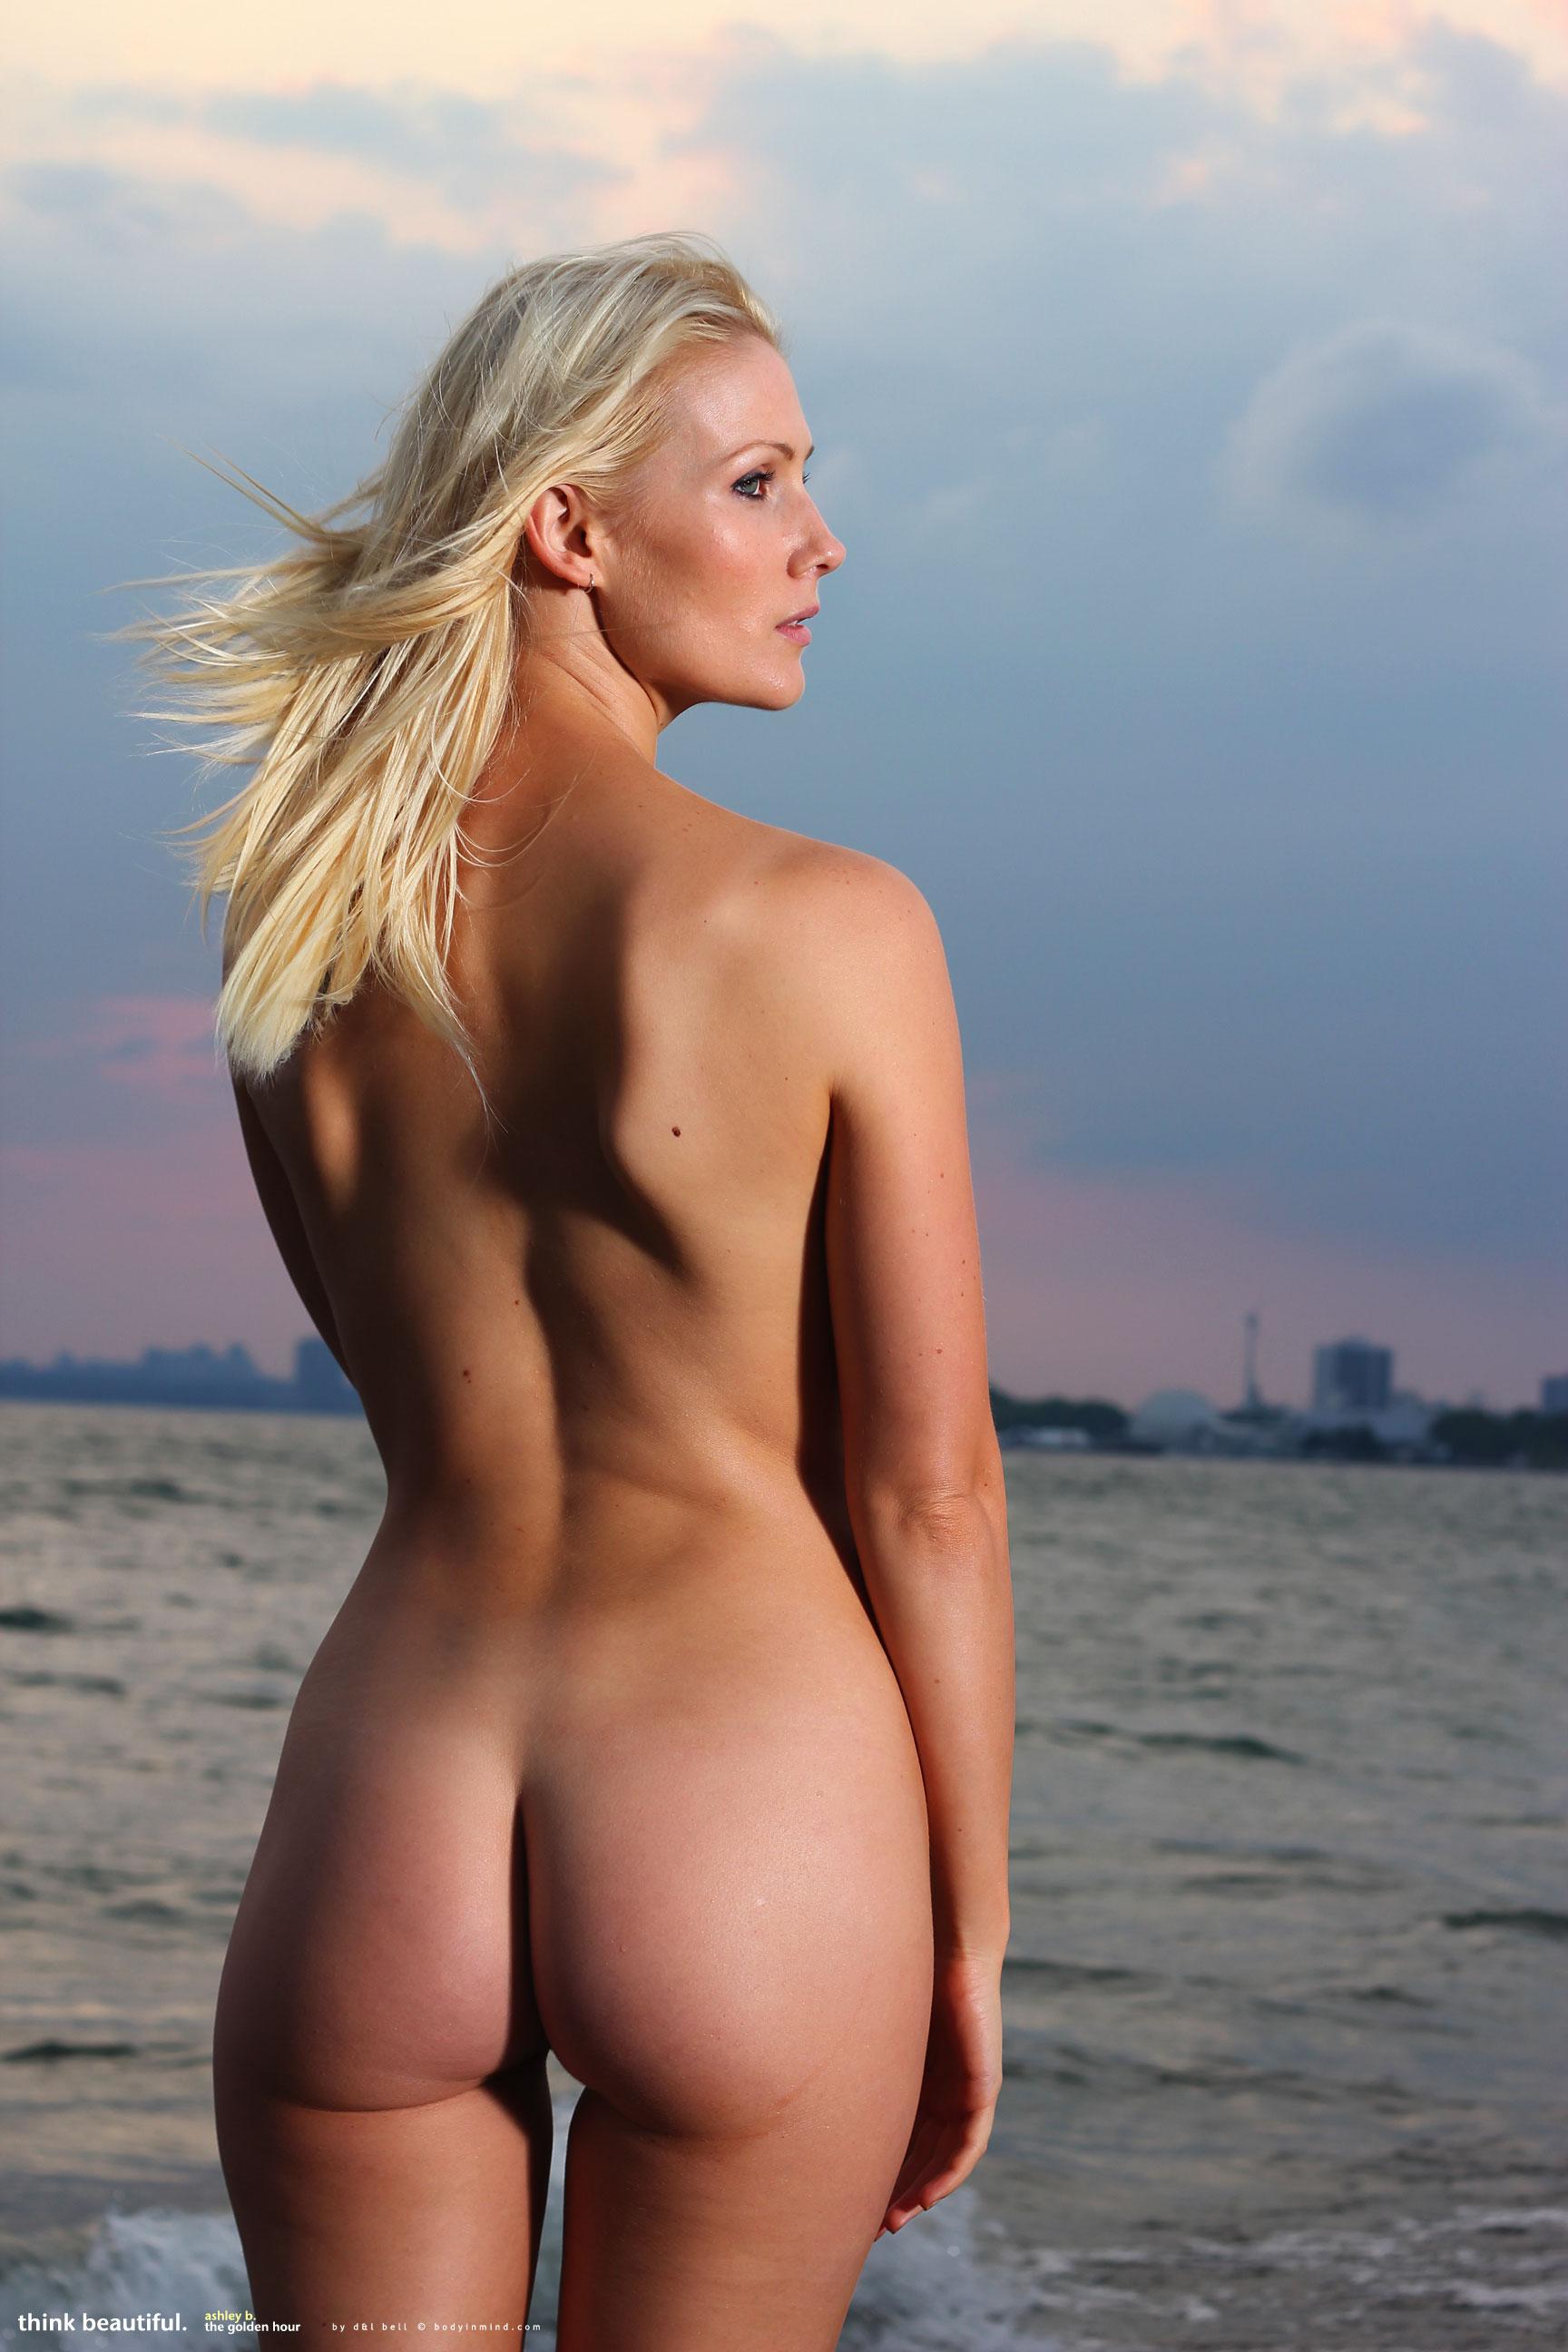 Ashley Golden - NudesPuri.com